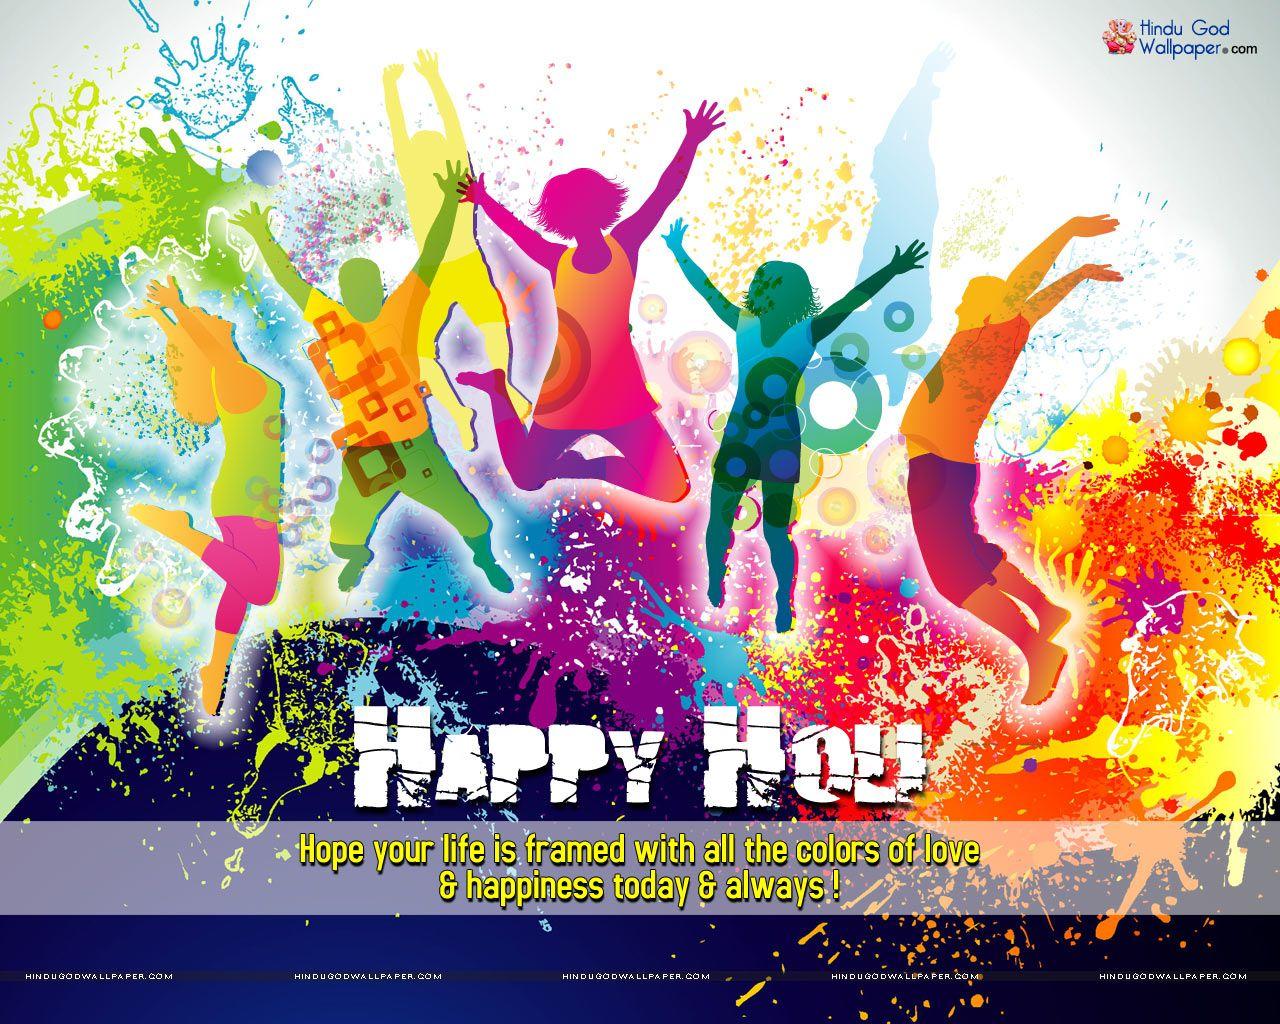 Simple Wallpaper Love Holi - d848c823e70c4588f4e2059a79c8f459  Perfect Image Reference_624334.jpg